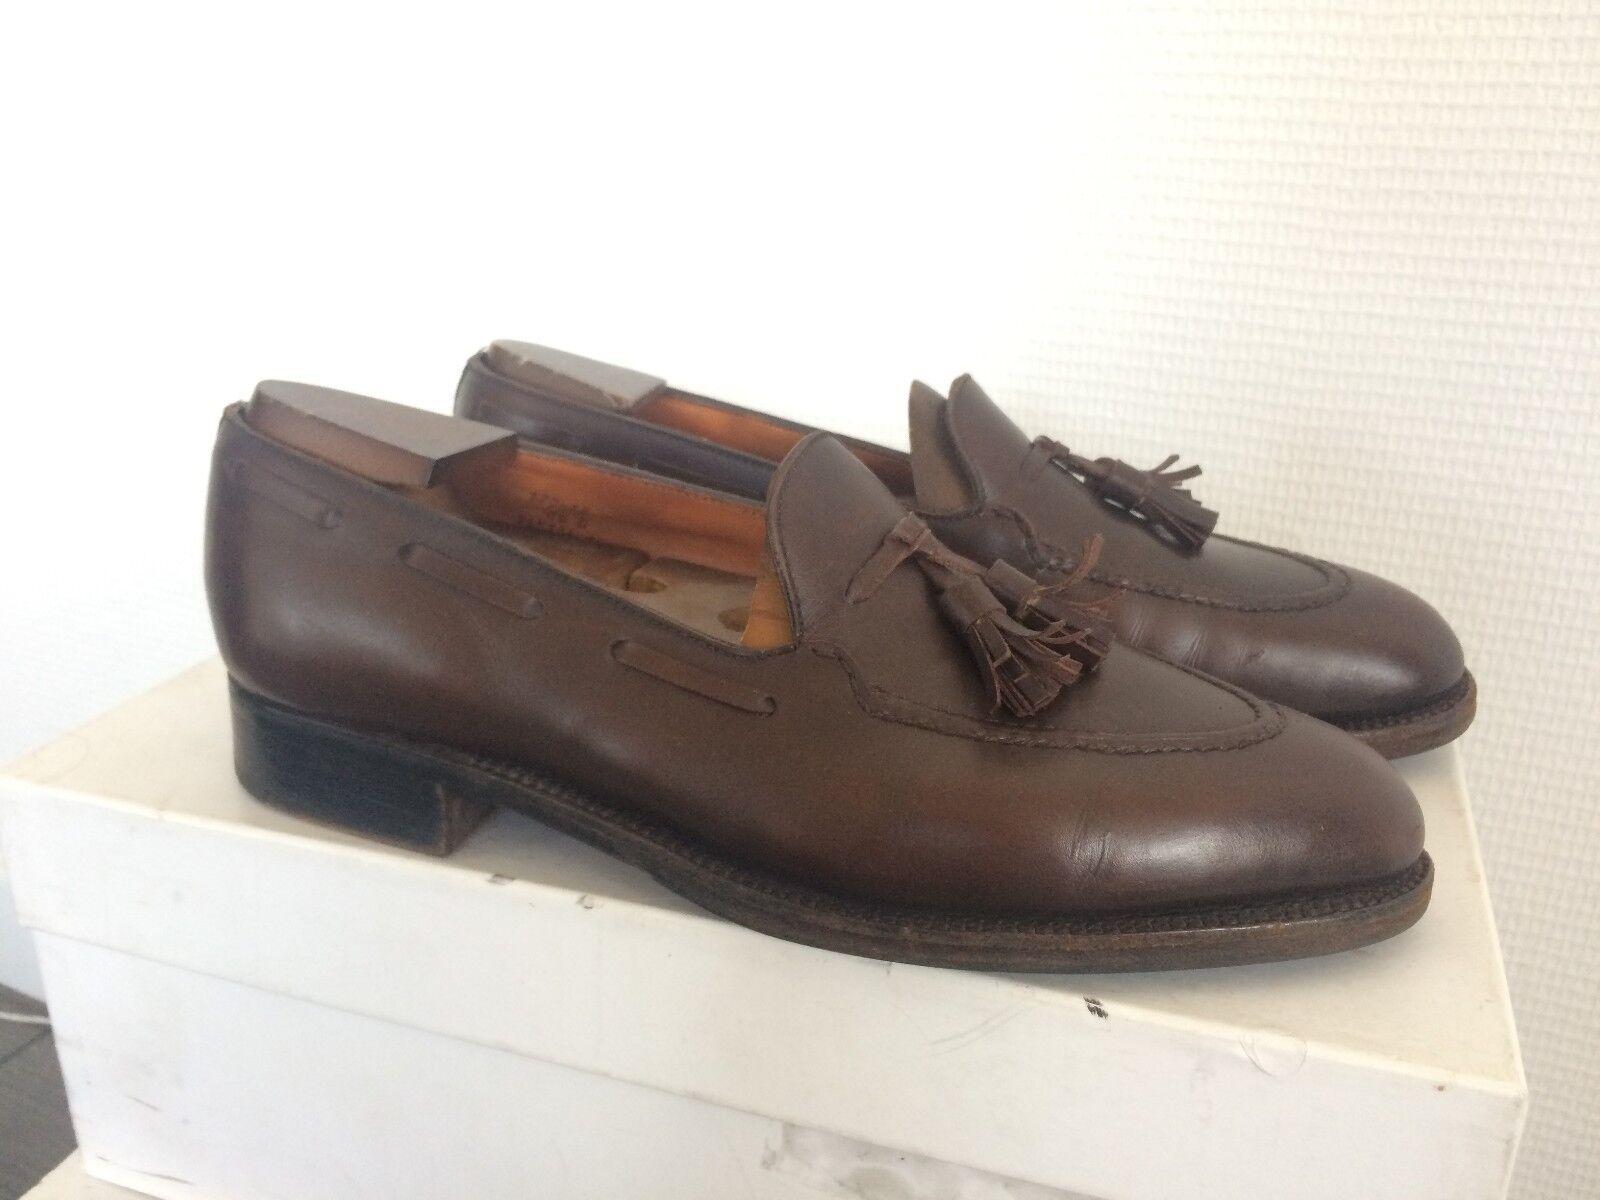 J.M WESTON Brown Loafers Size 6,5 D / EU 40 /   7 - 7,5 - France